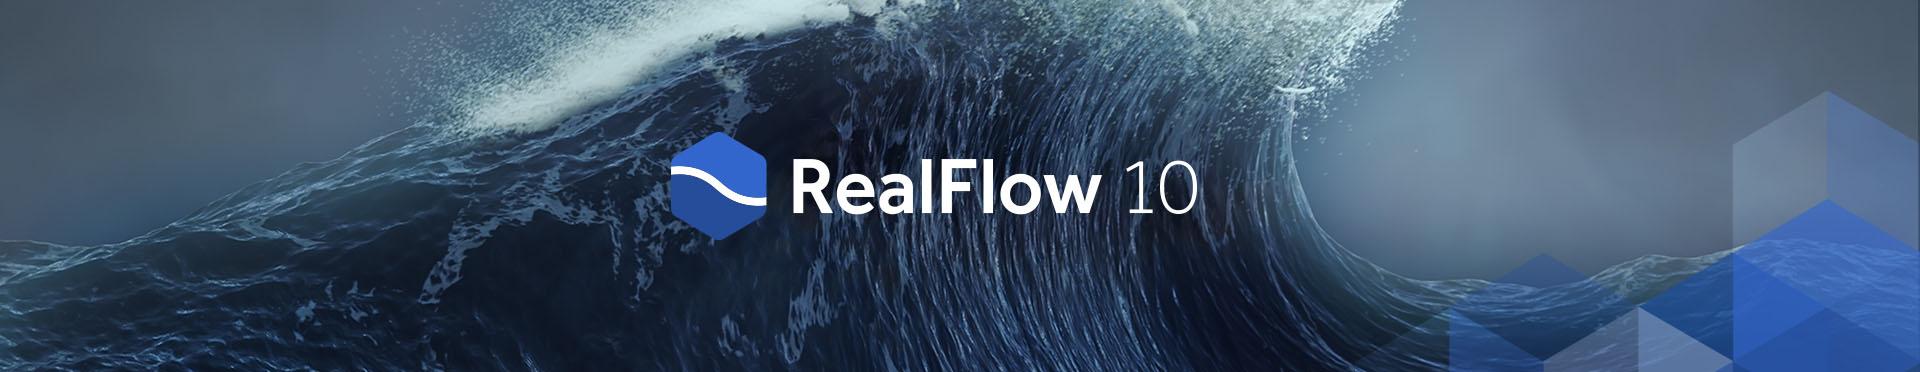 RealFlow 10